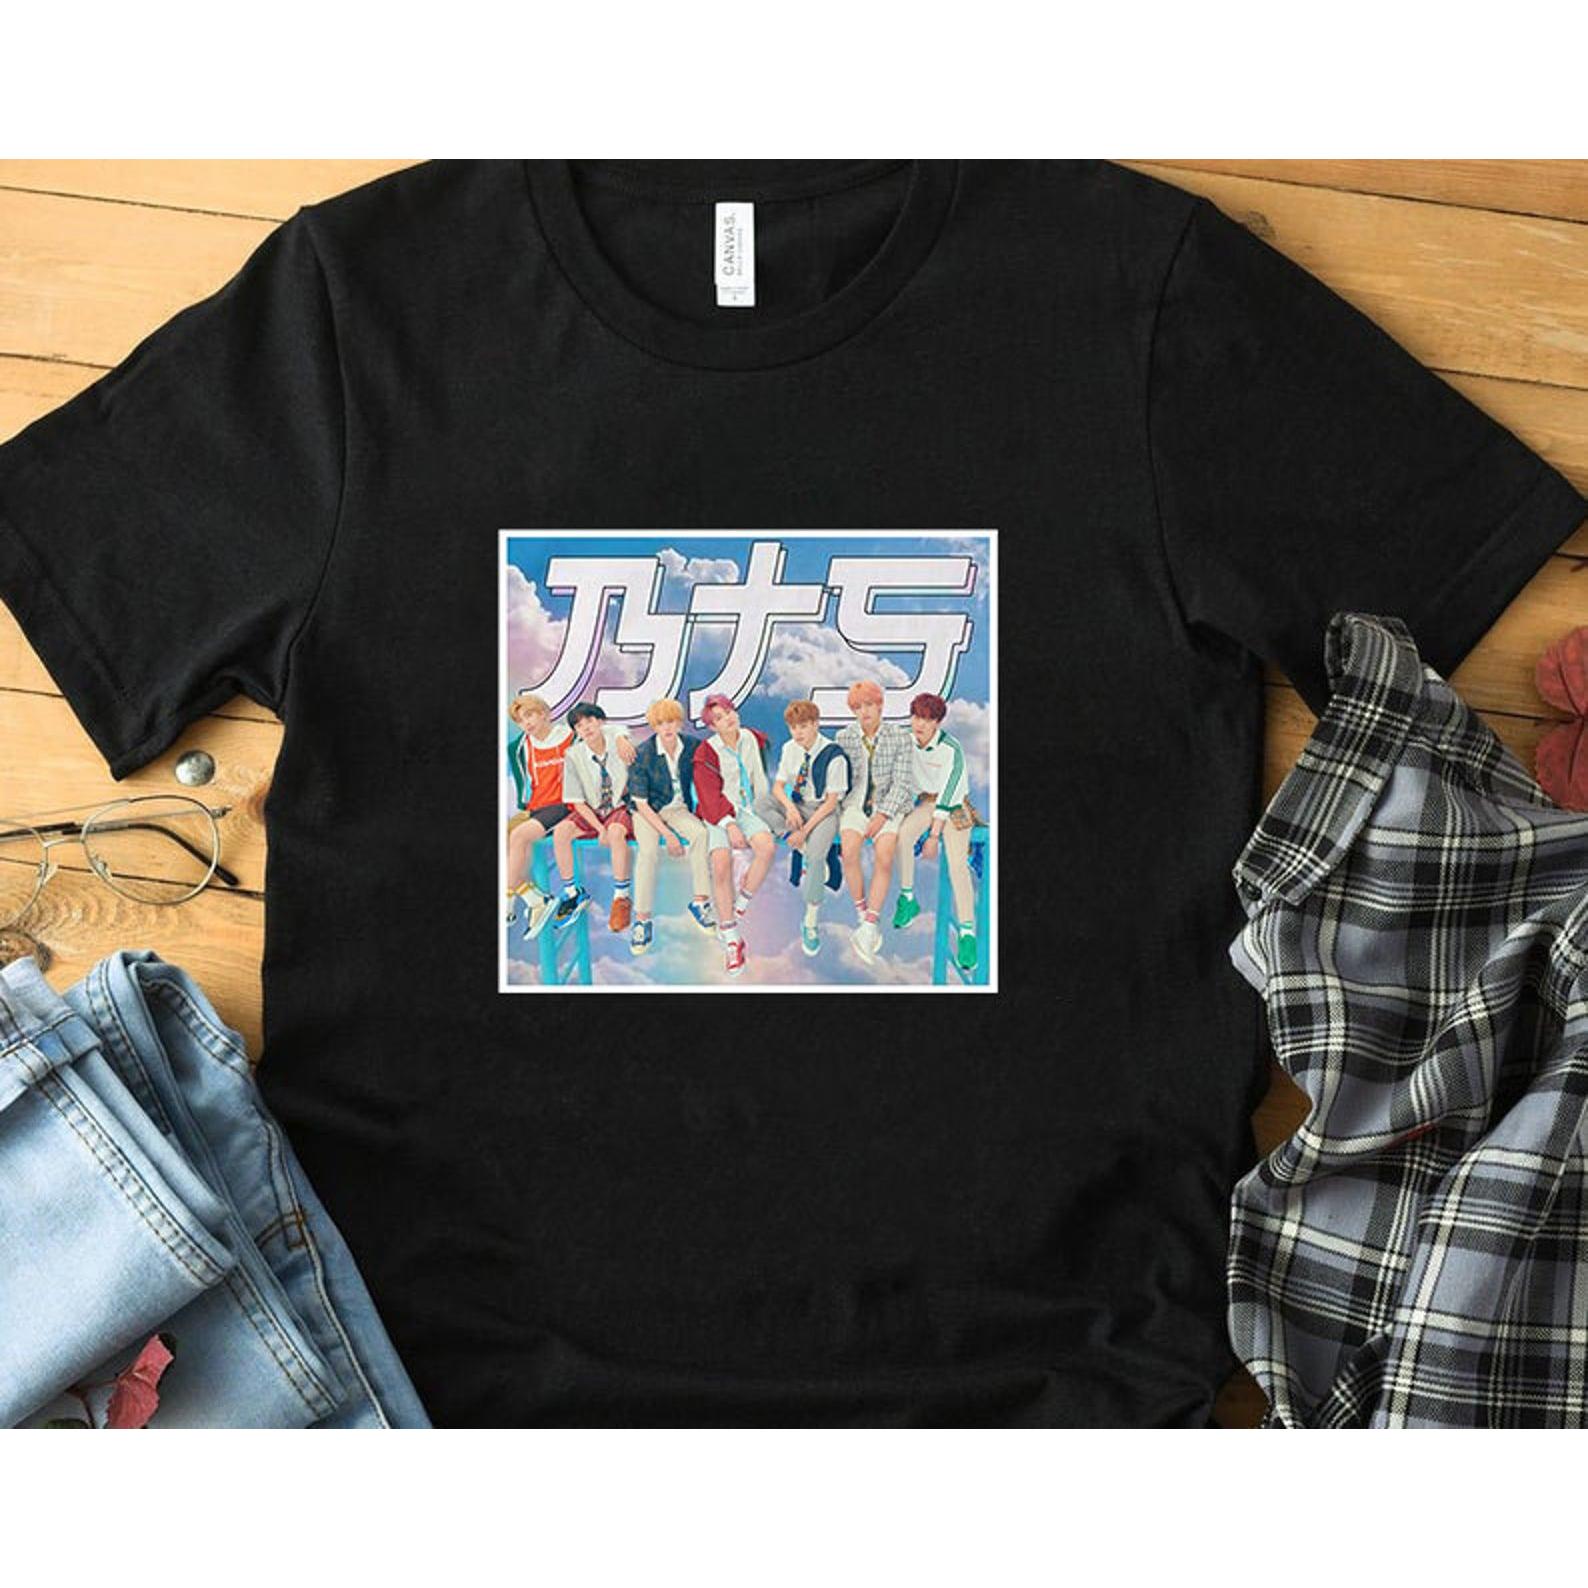 Demonan Store Vintage BTS T-Shirt